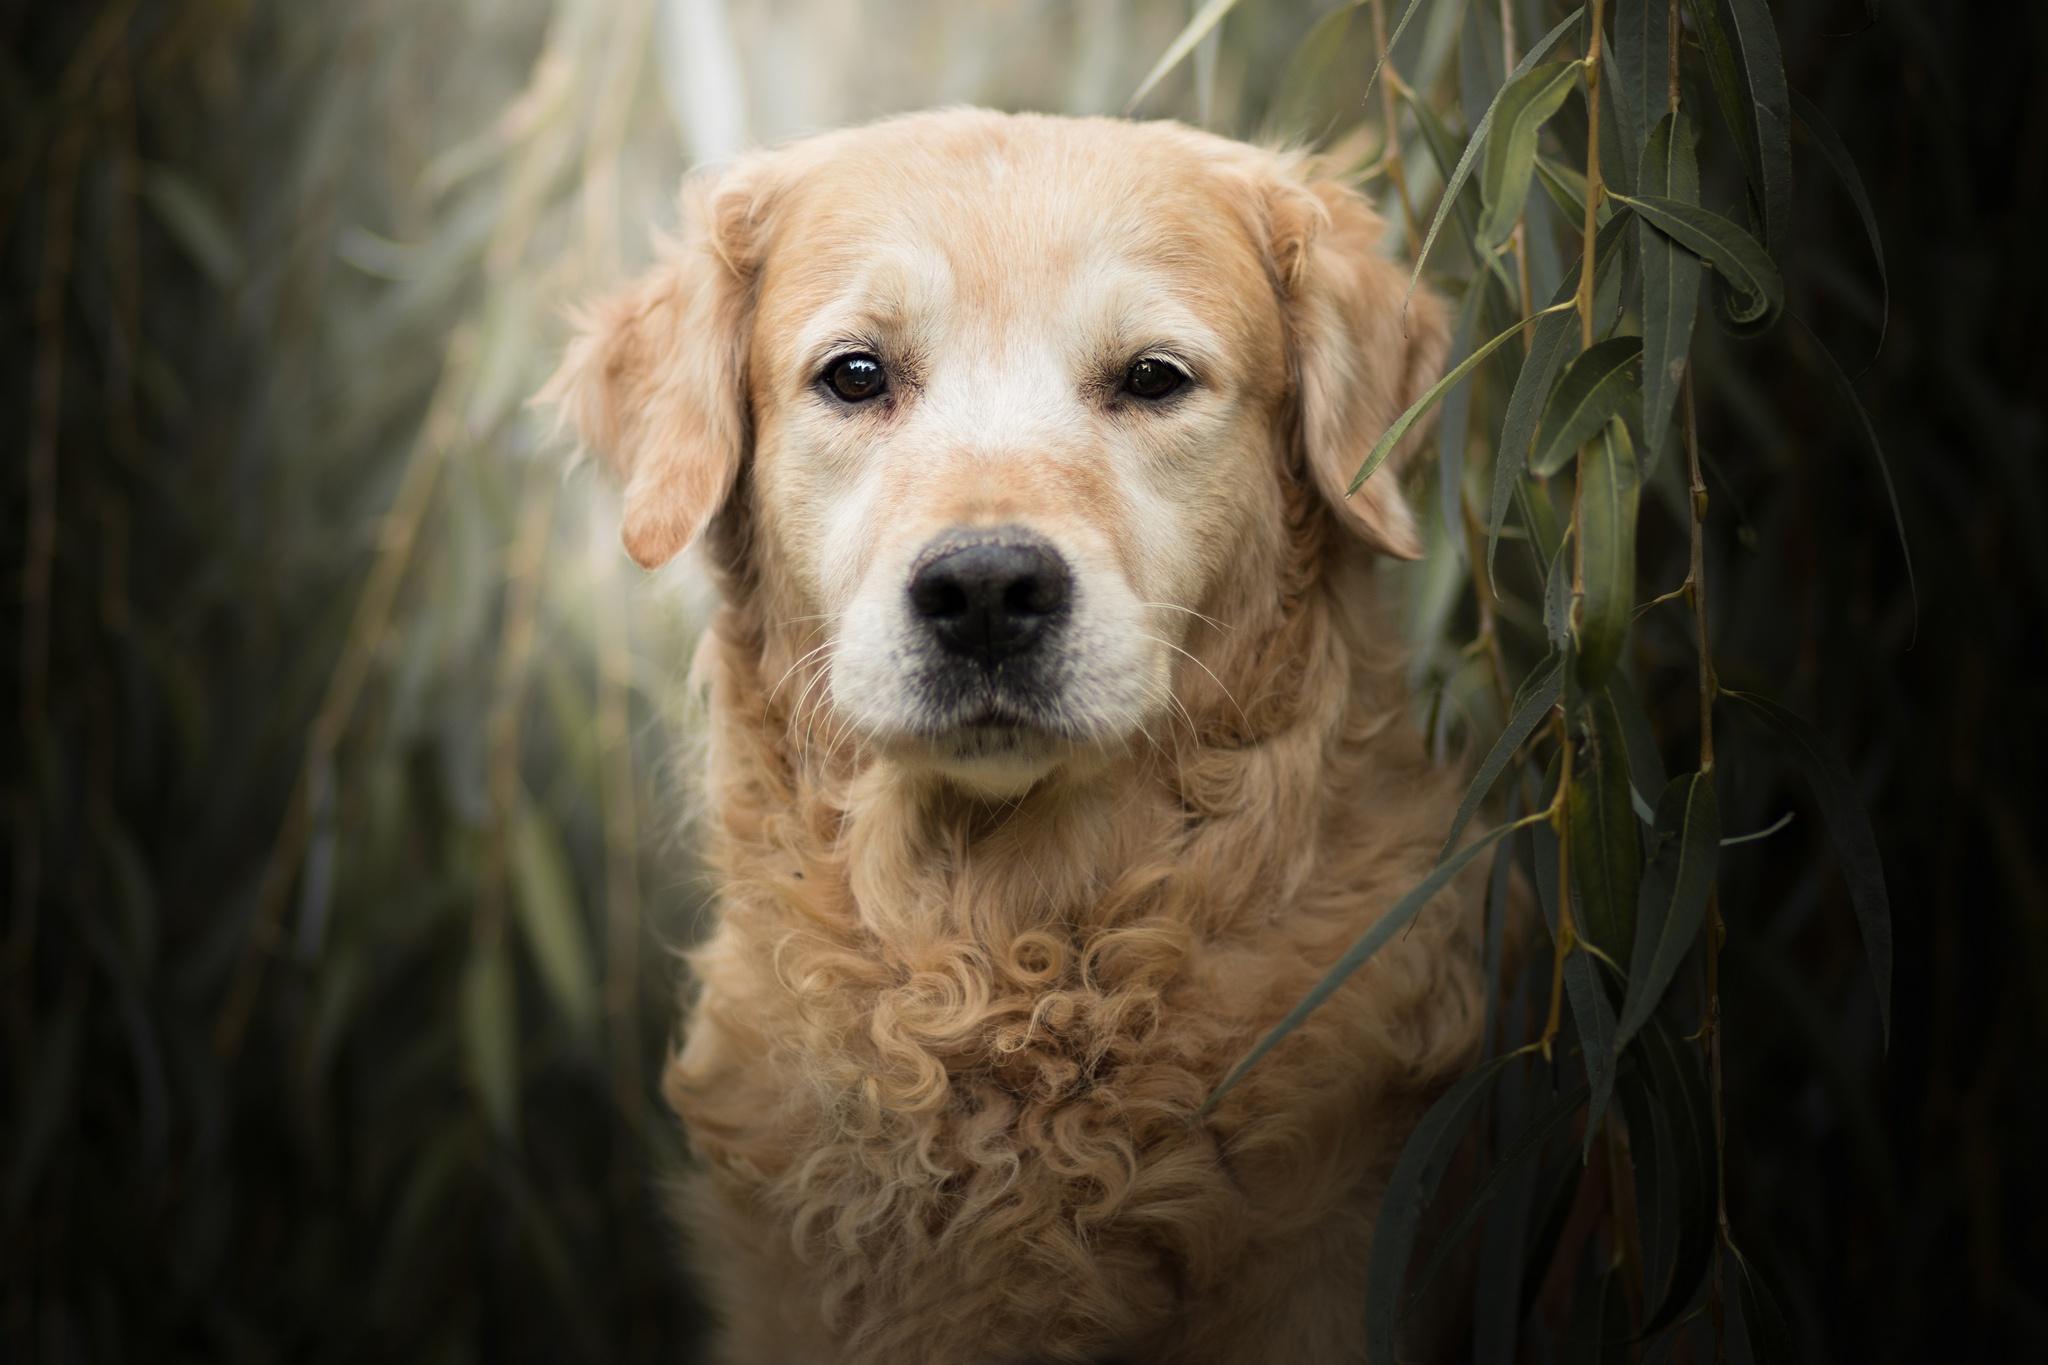 Dog Pet Stare 2048x1365